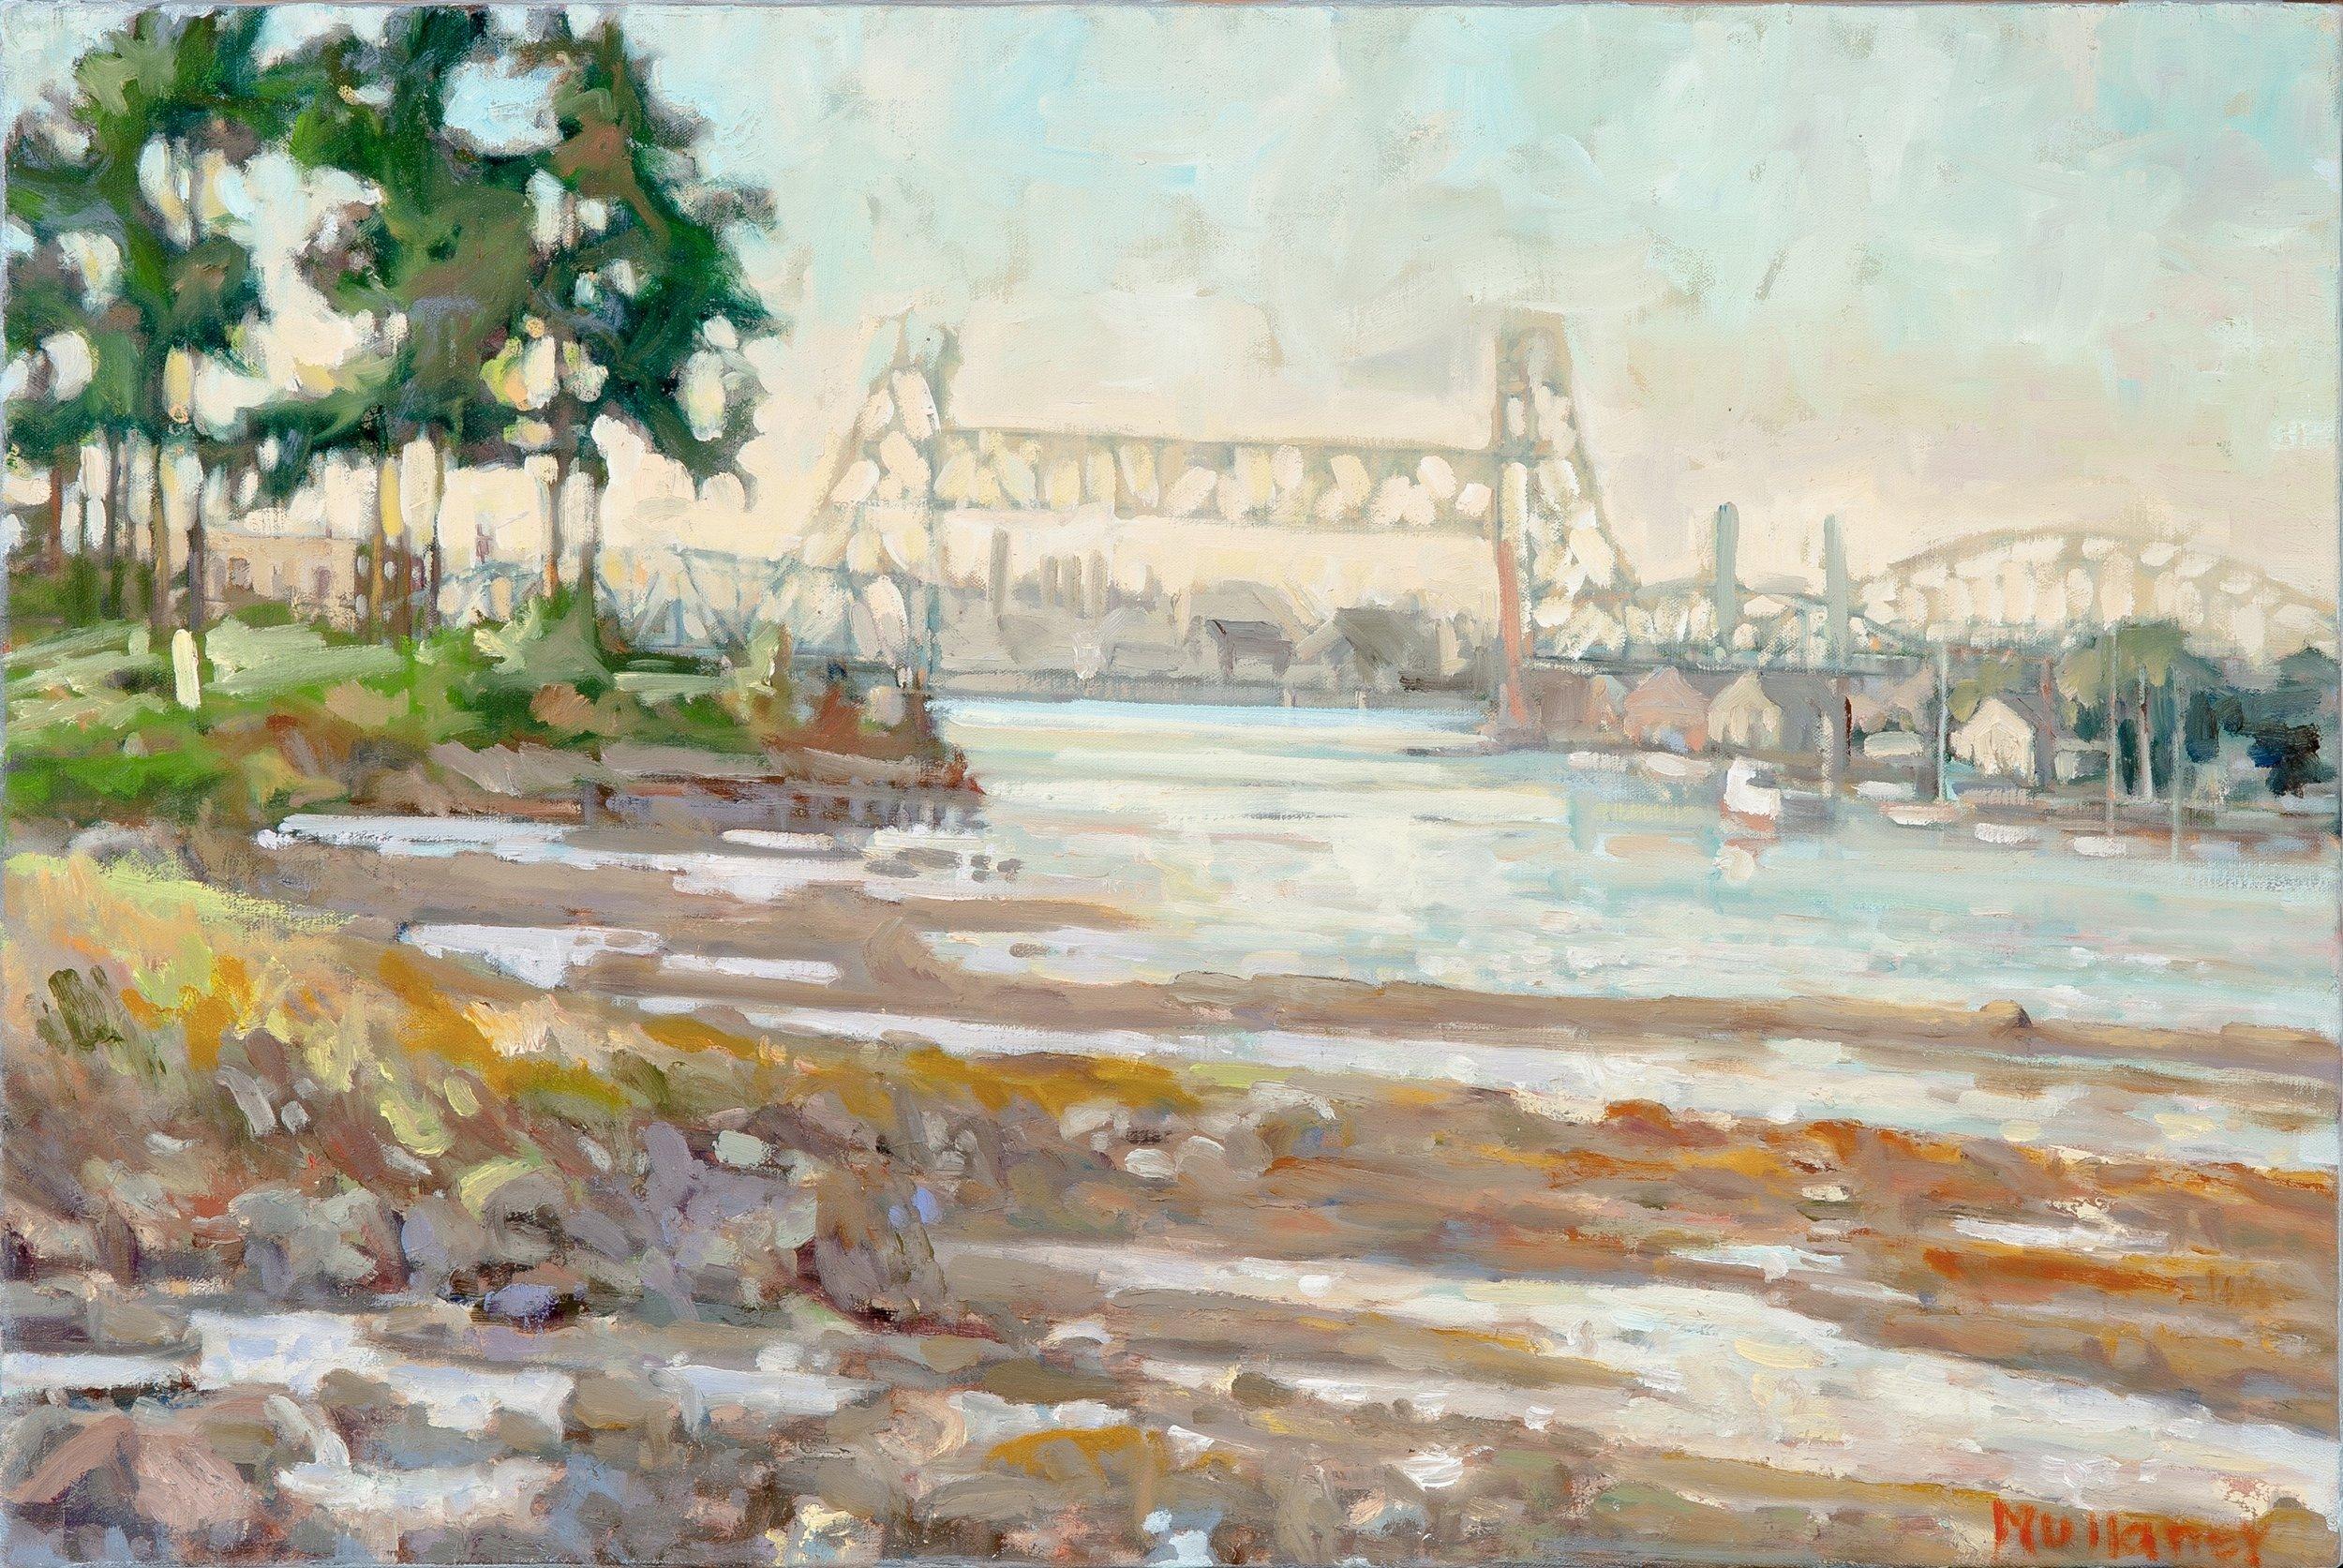 Three Bridges, oils, 30 x 22